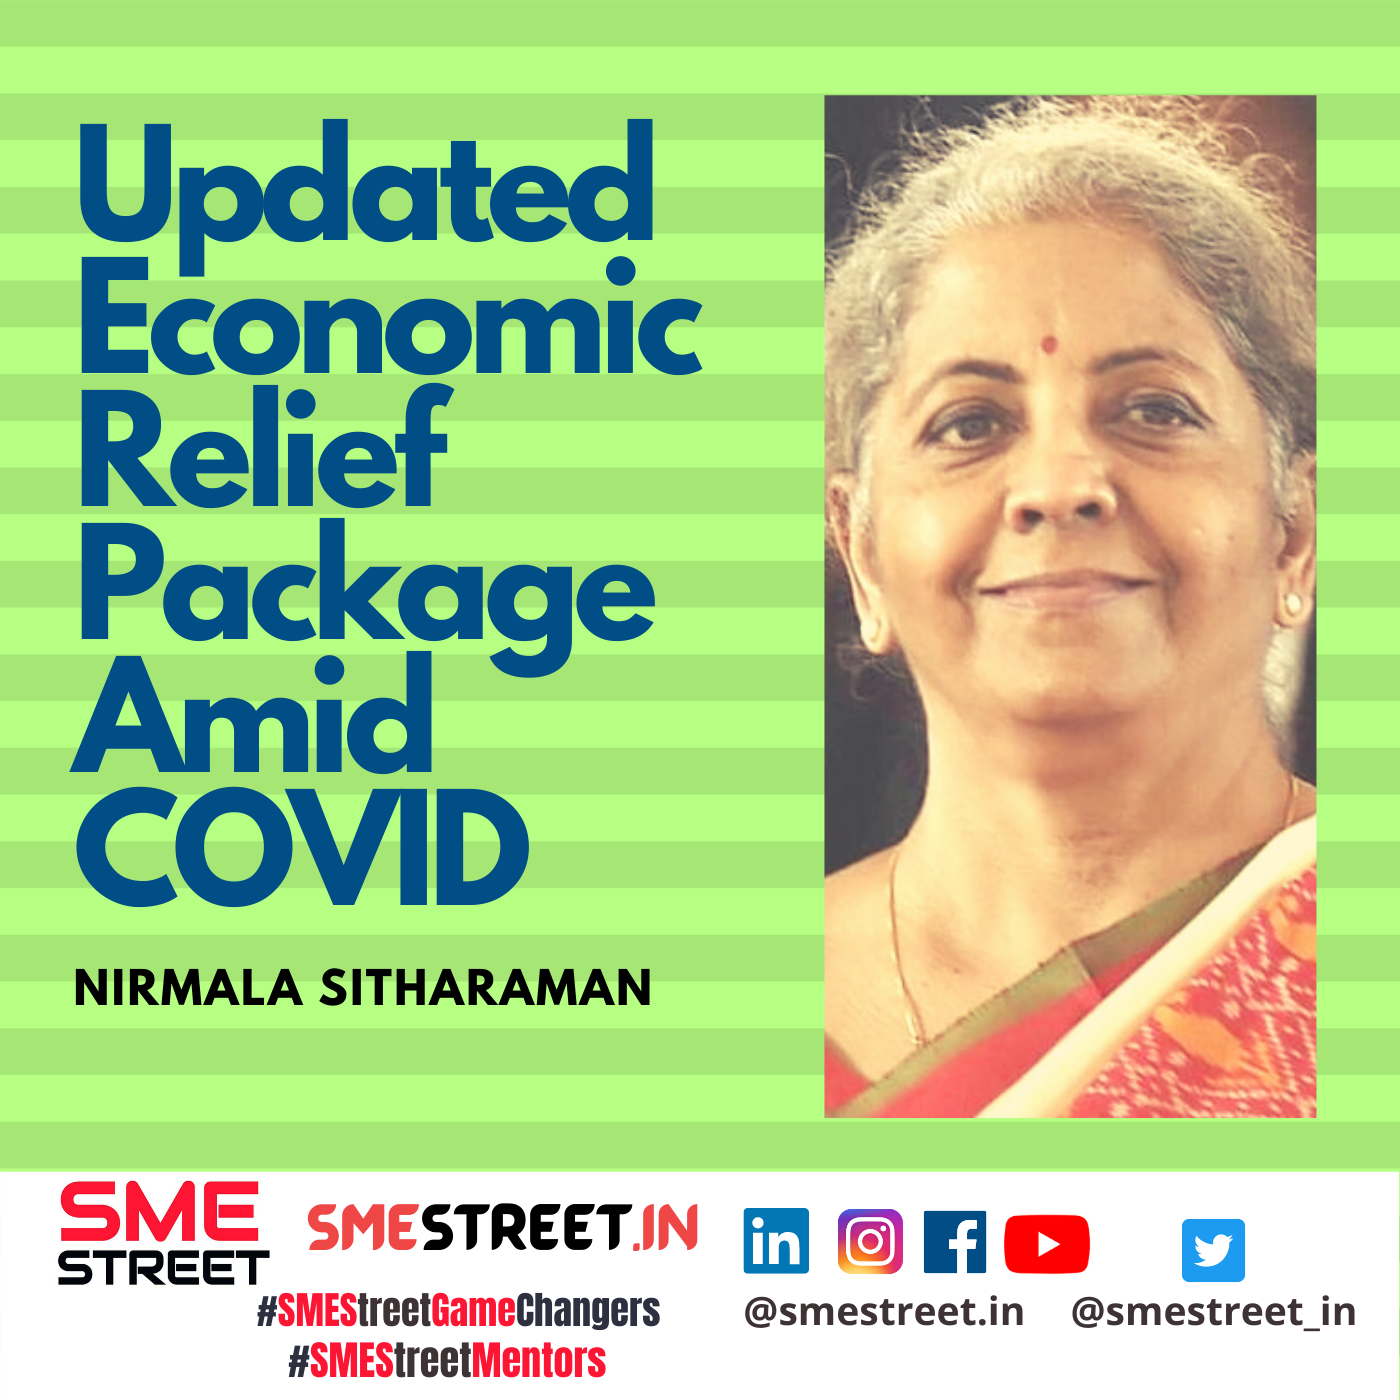 Nirmala Sitharaman, SMEStreet, Updated Economic Relief Package